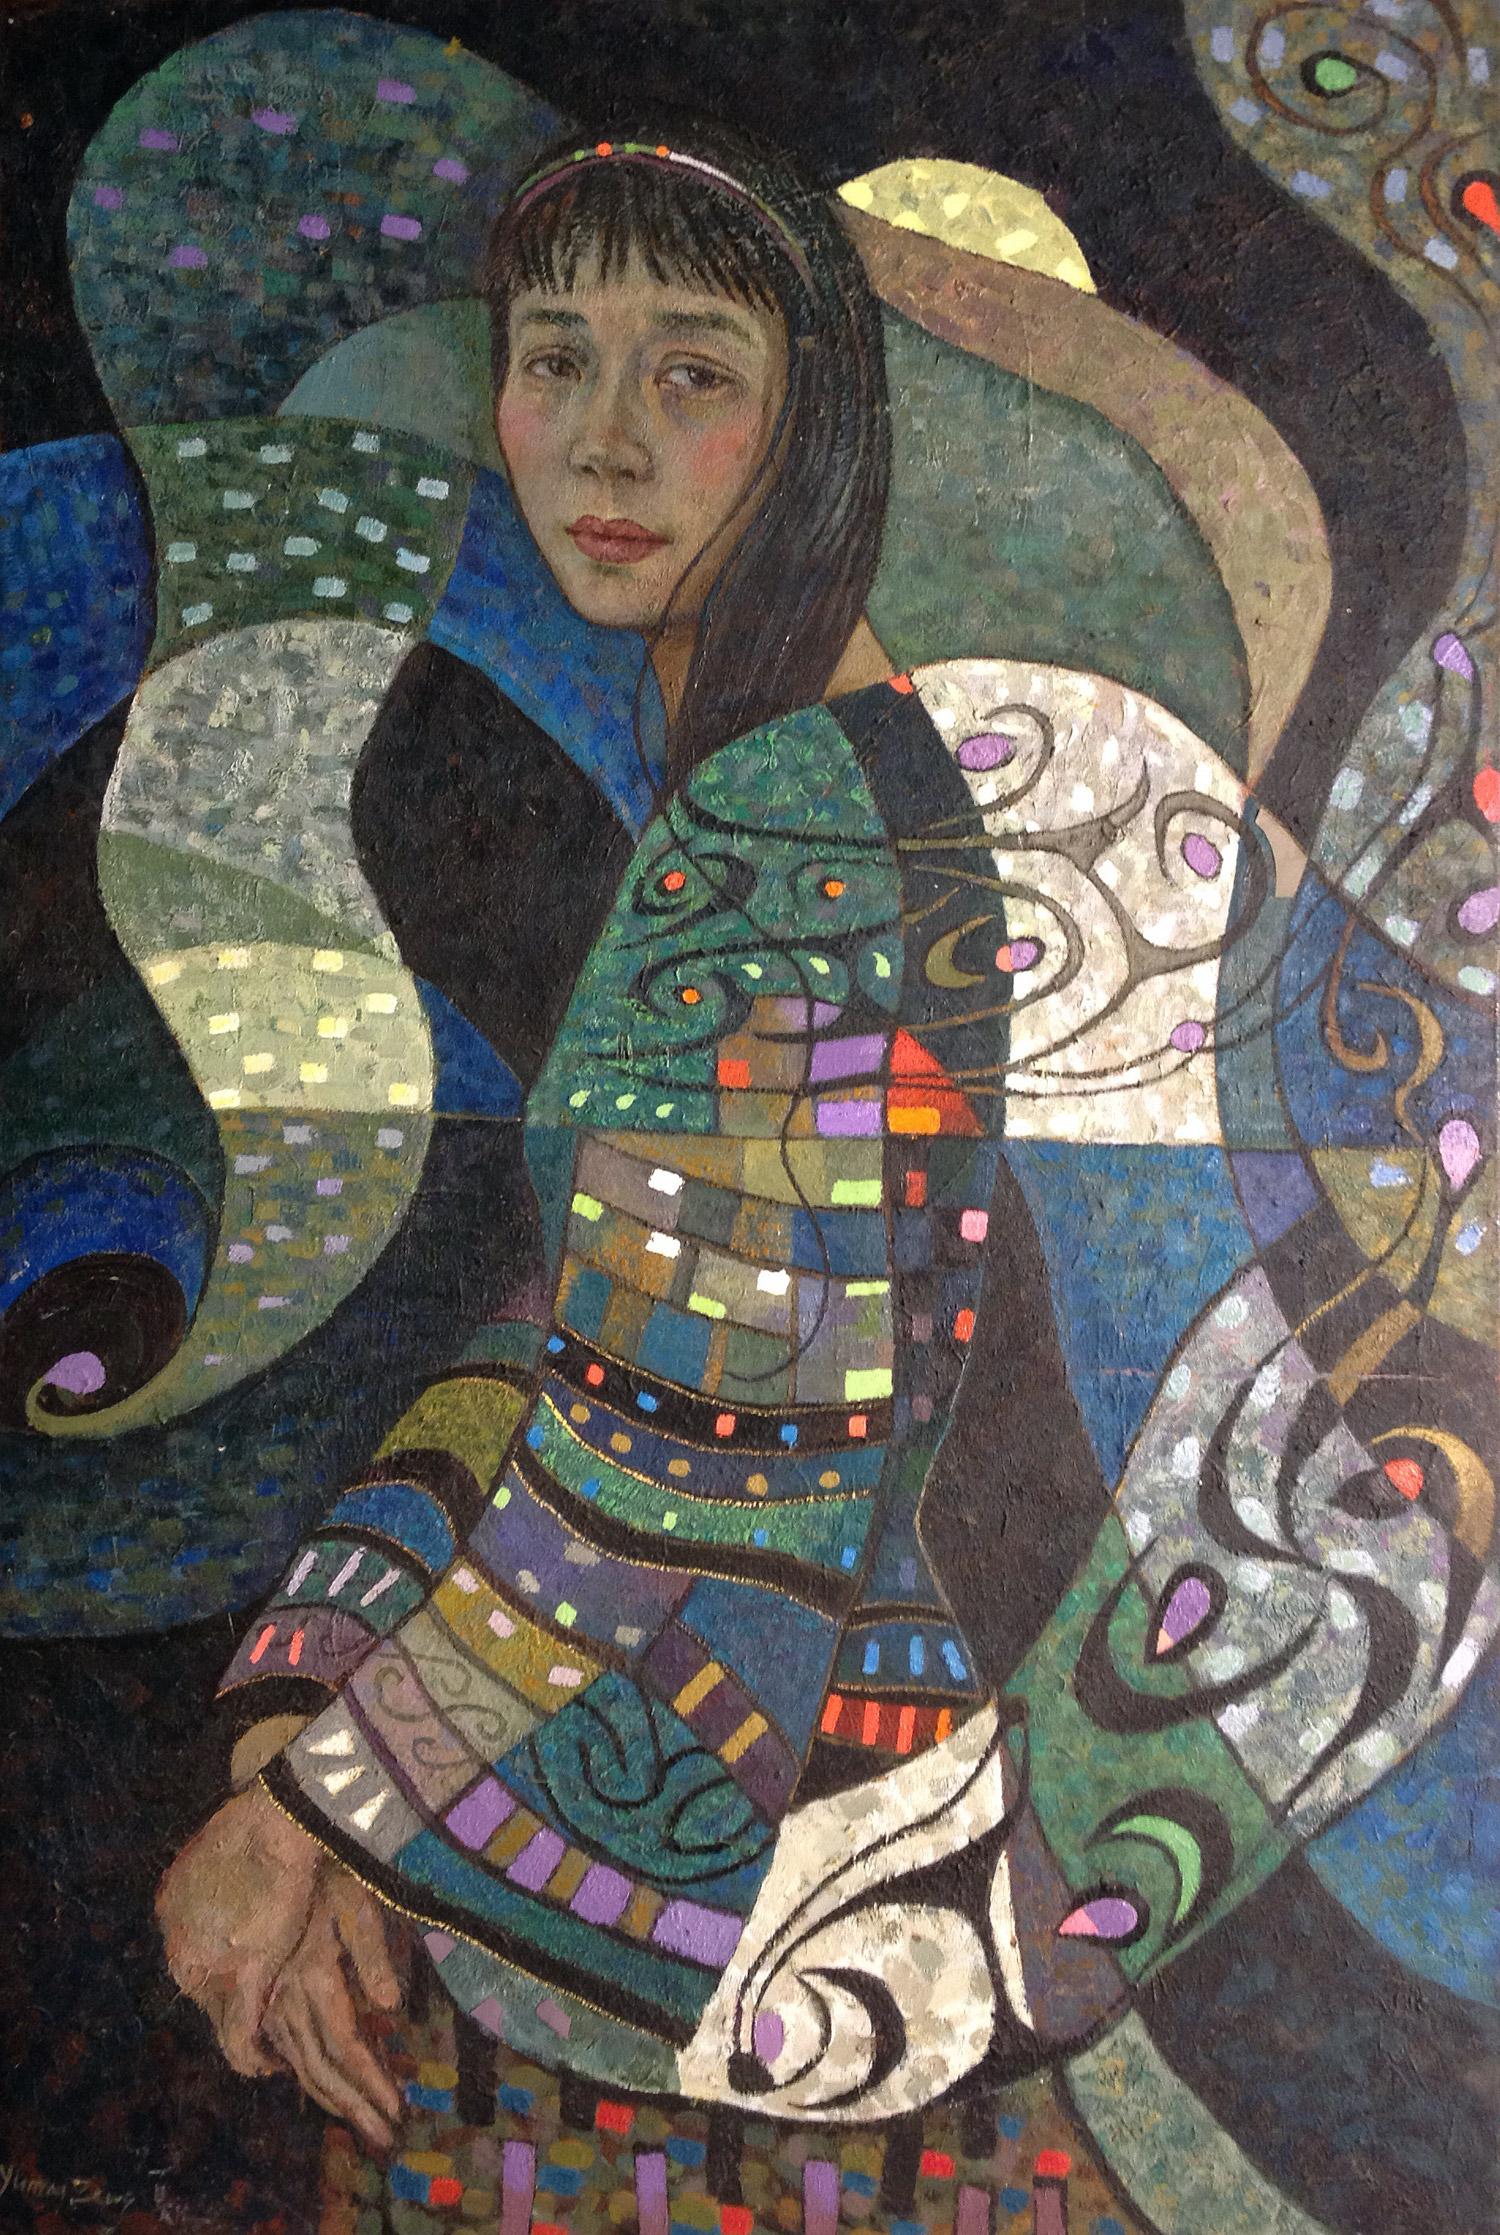 #14667 Yuman Zeng 'Dream' 92cm x 136 $20800